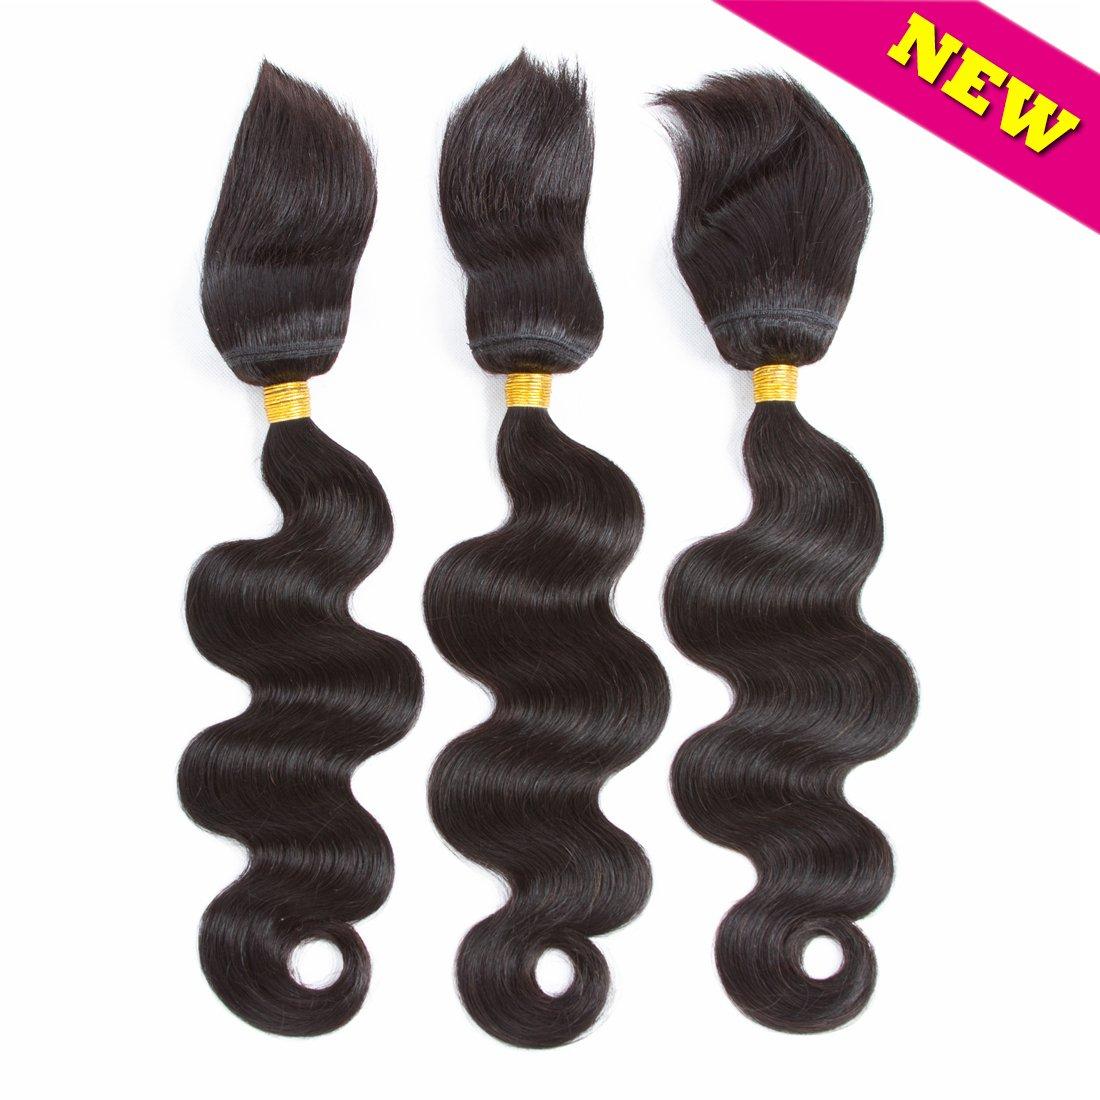 Braid in Bundles Unprocessed Brazilian Virgin Hair Body Wave 3 Bundles 120g/Pc No Glue No Thread Braid in Virgin Human Hair Extensions (12 12 12) Ltd